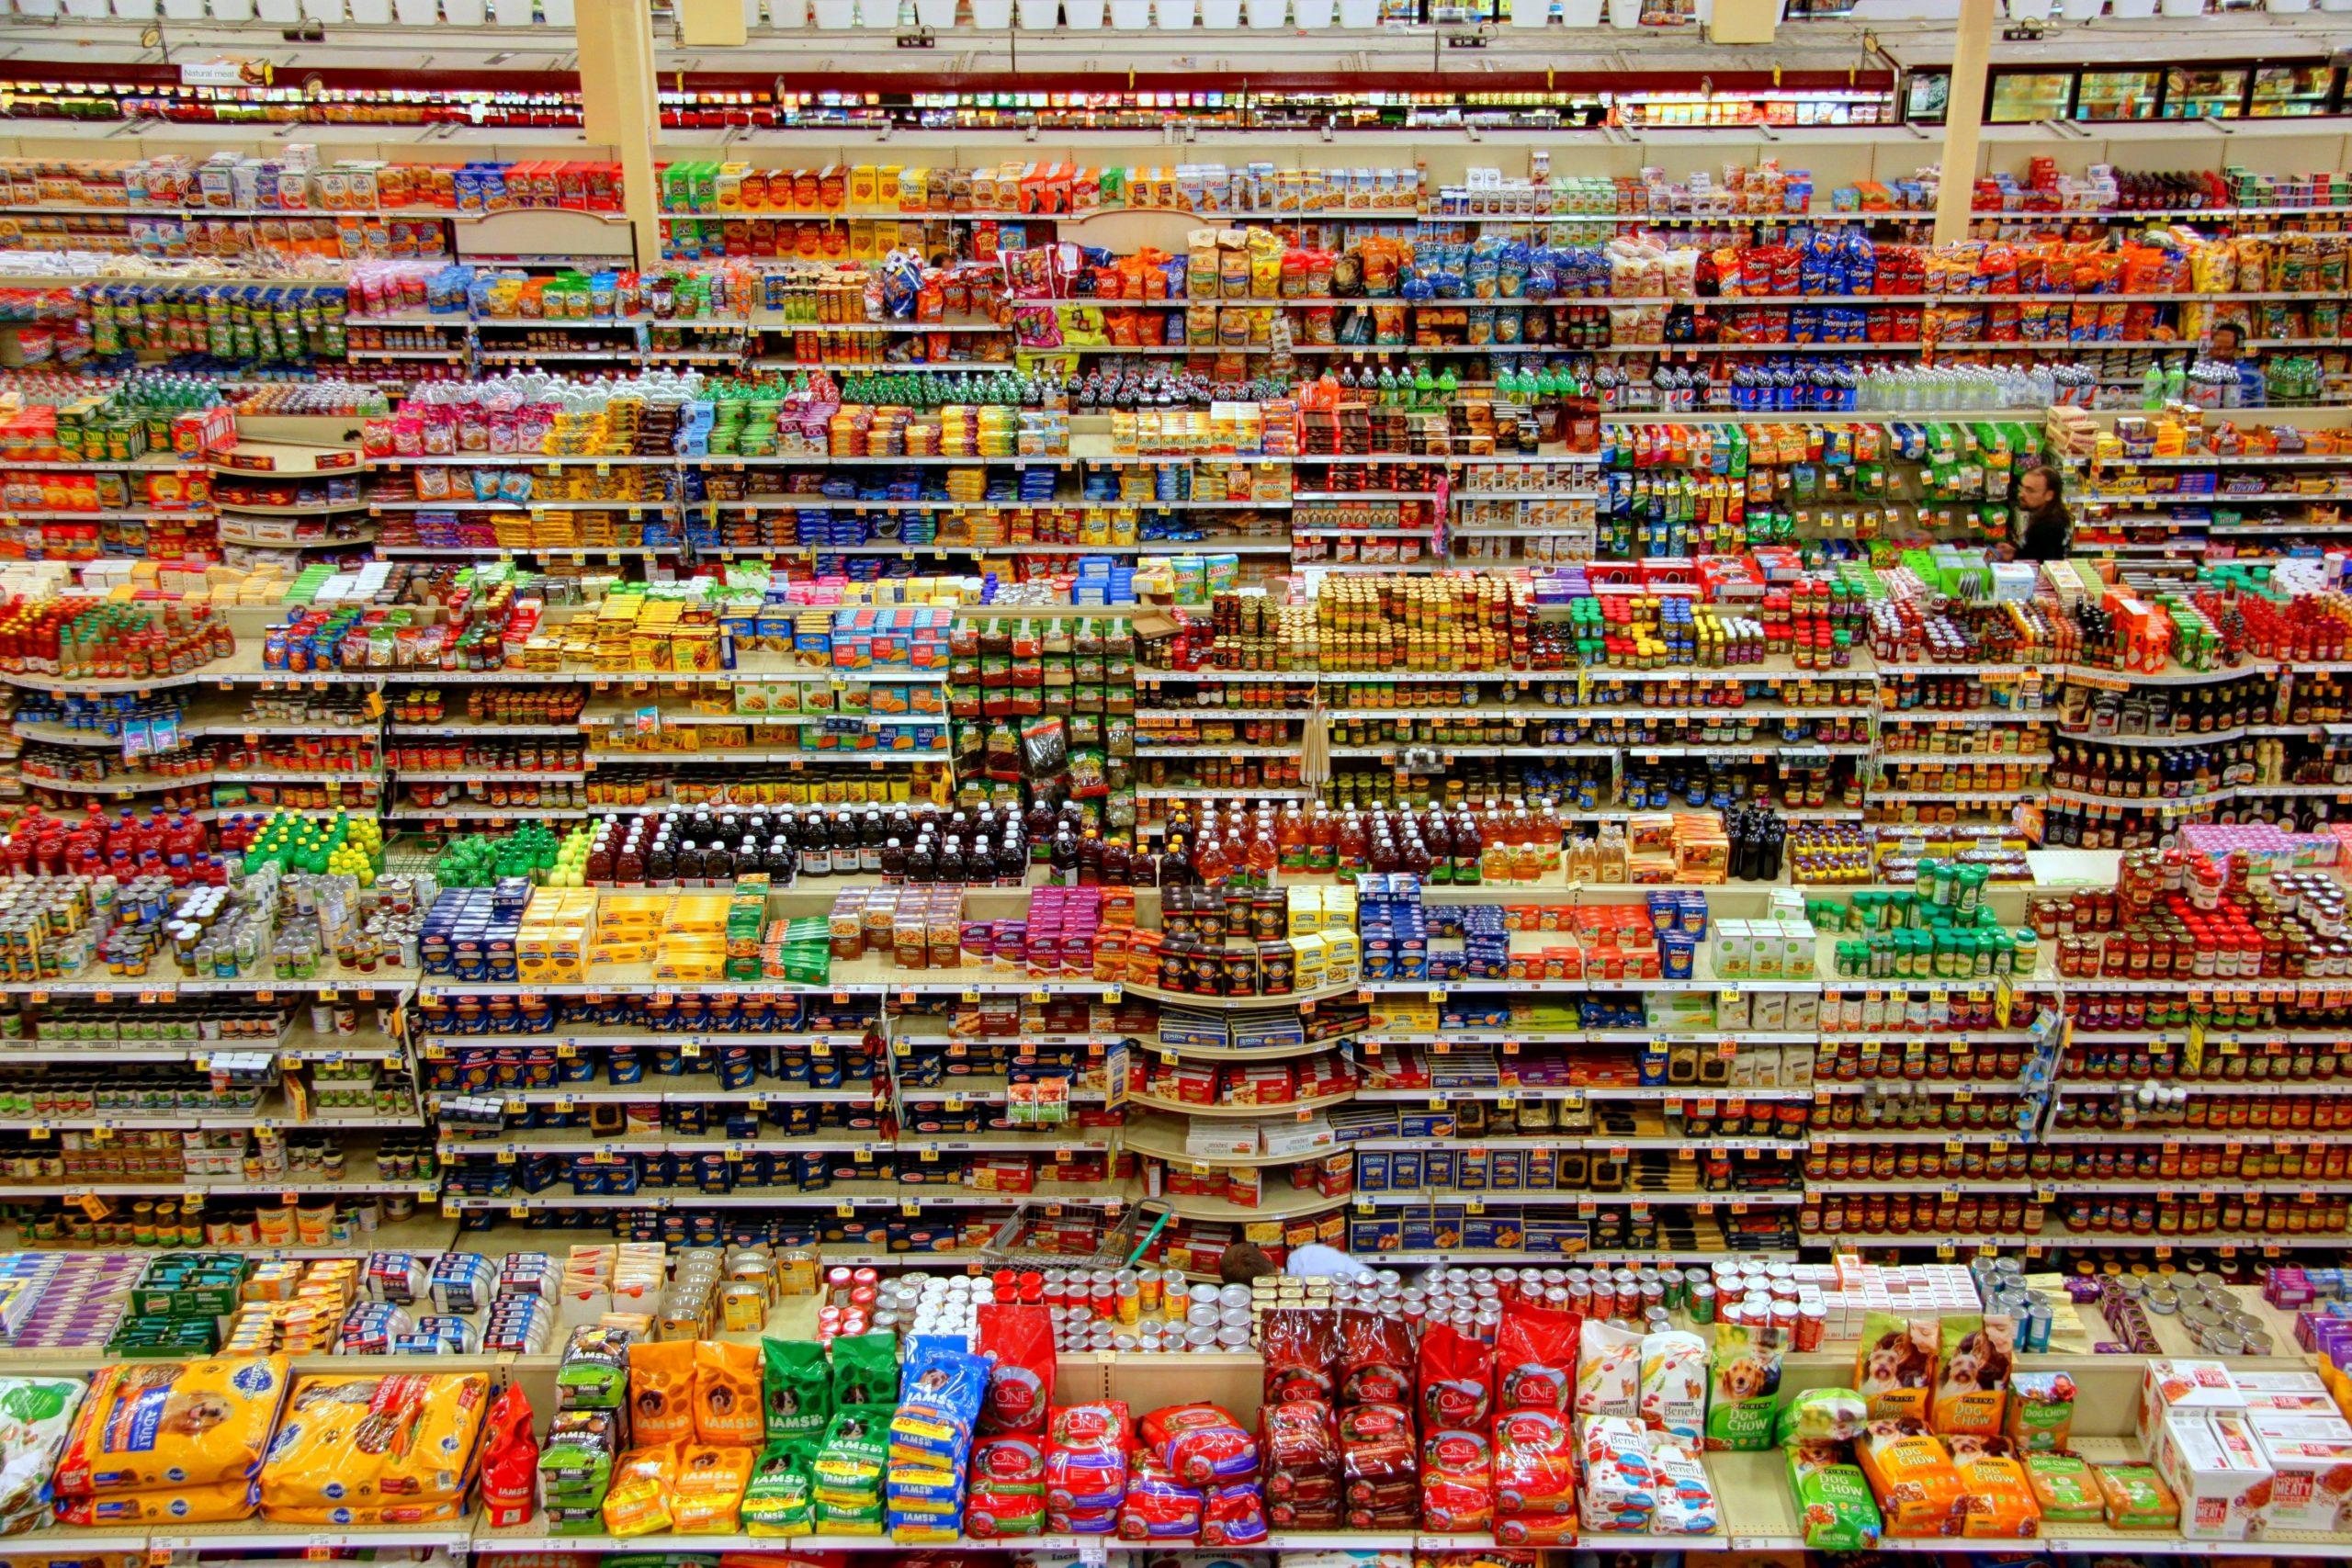 crowded supermarket